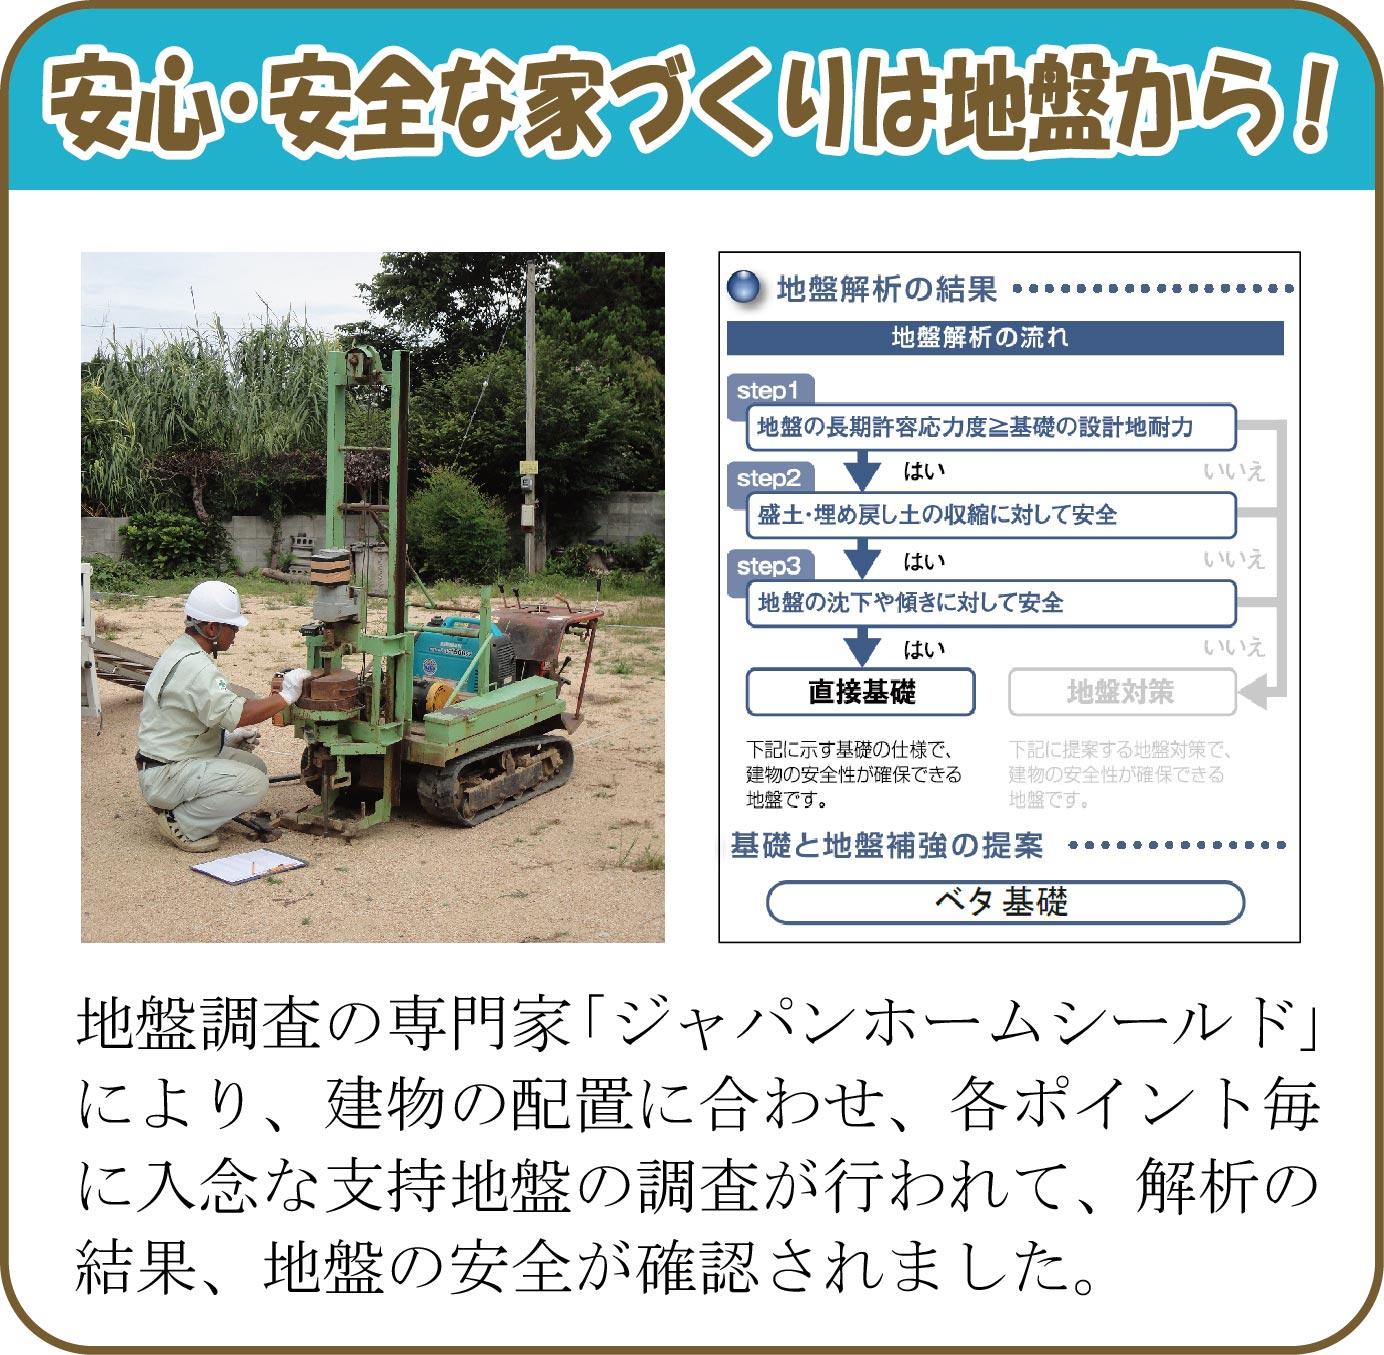 KuraSi-natu-sin89-05.jpg